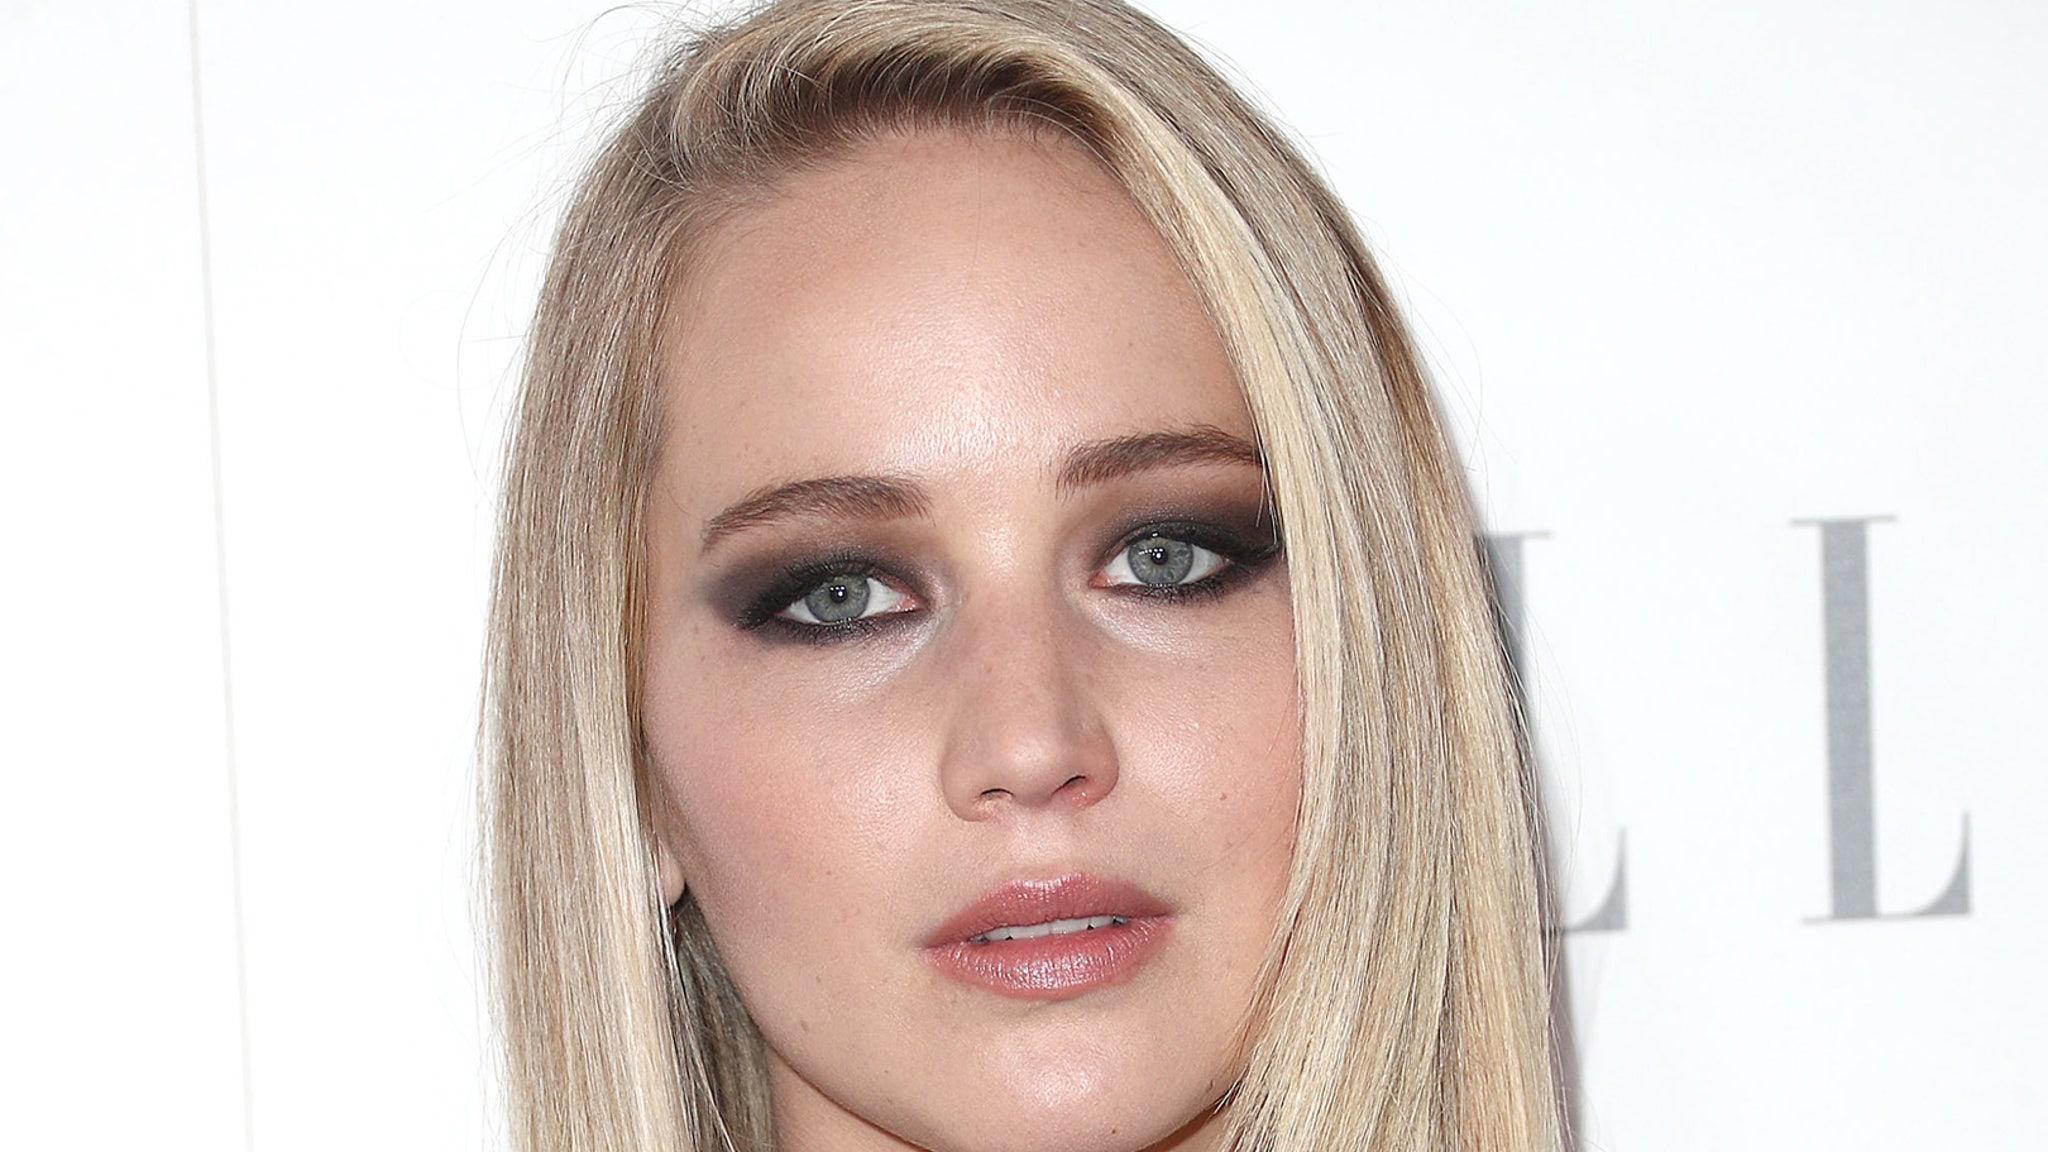 Jennifer Lawrence Talks About 2014 Nude Photo Hack